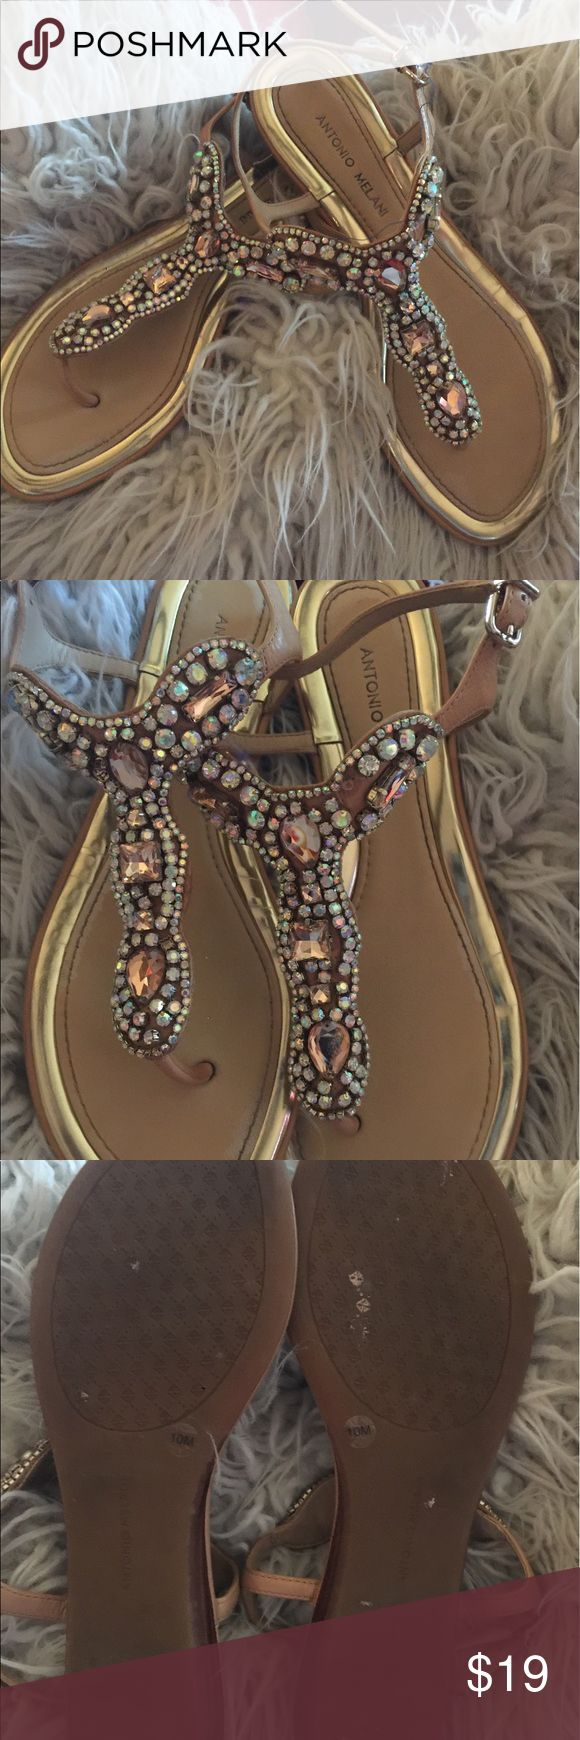 ANTONIO MELANI!! ANTONIO MELANI flats. Worn twice to prom. One stone missing but not noticeable. Gorgeous flats! Excellent condition! ANTONIO MELANI Shoes Sandals